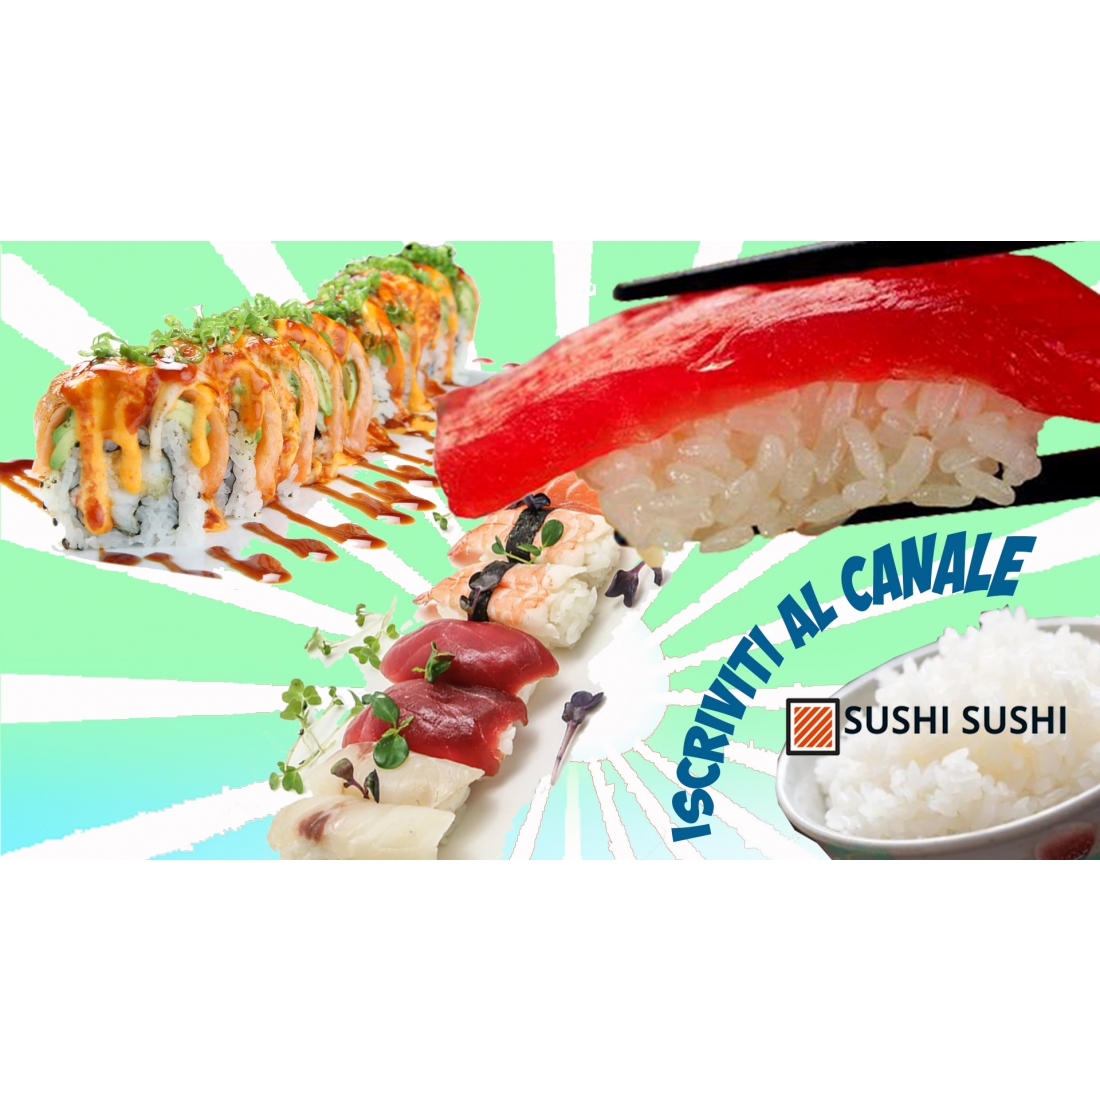 Le video ricette di Sushi sushi